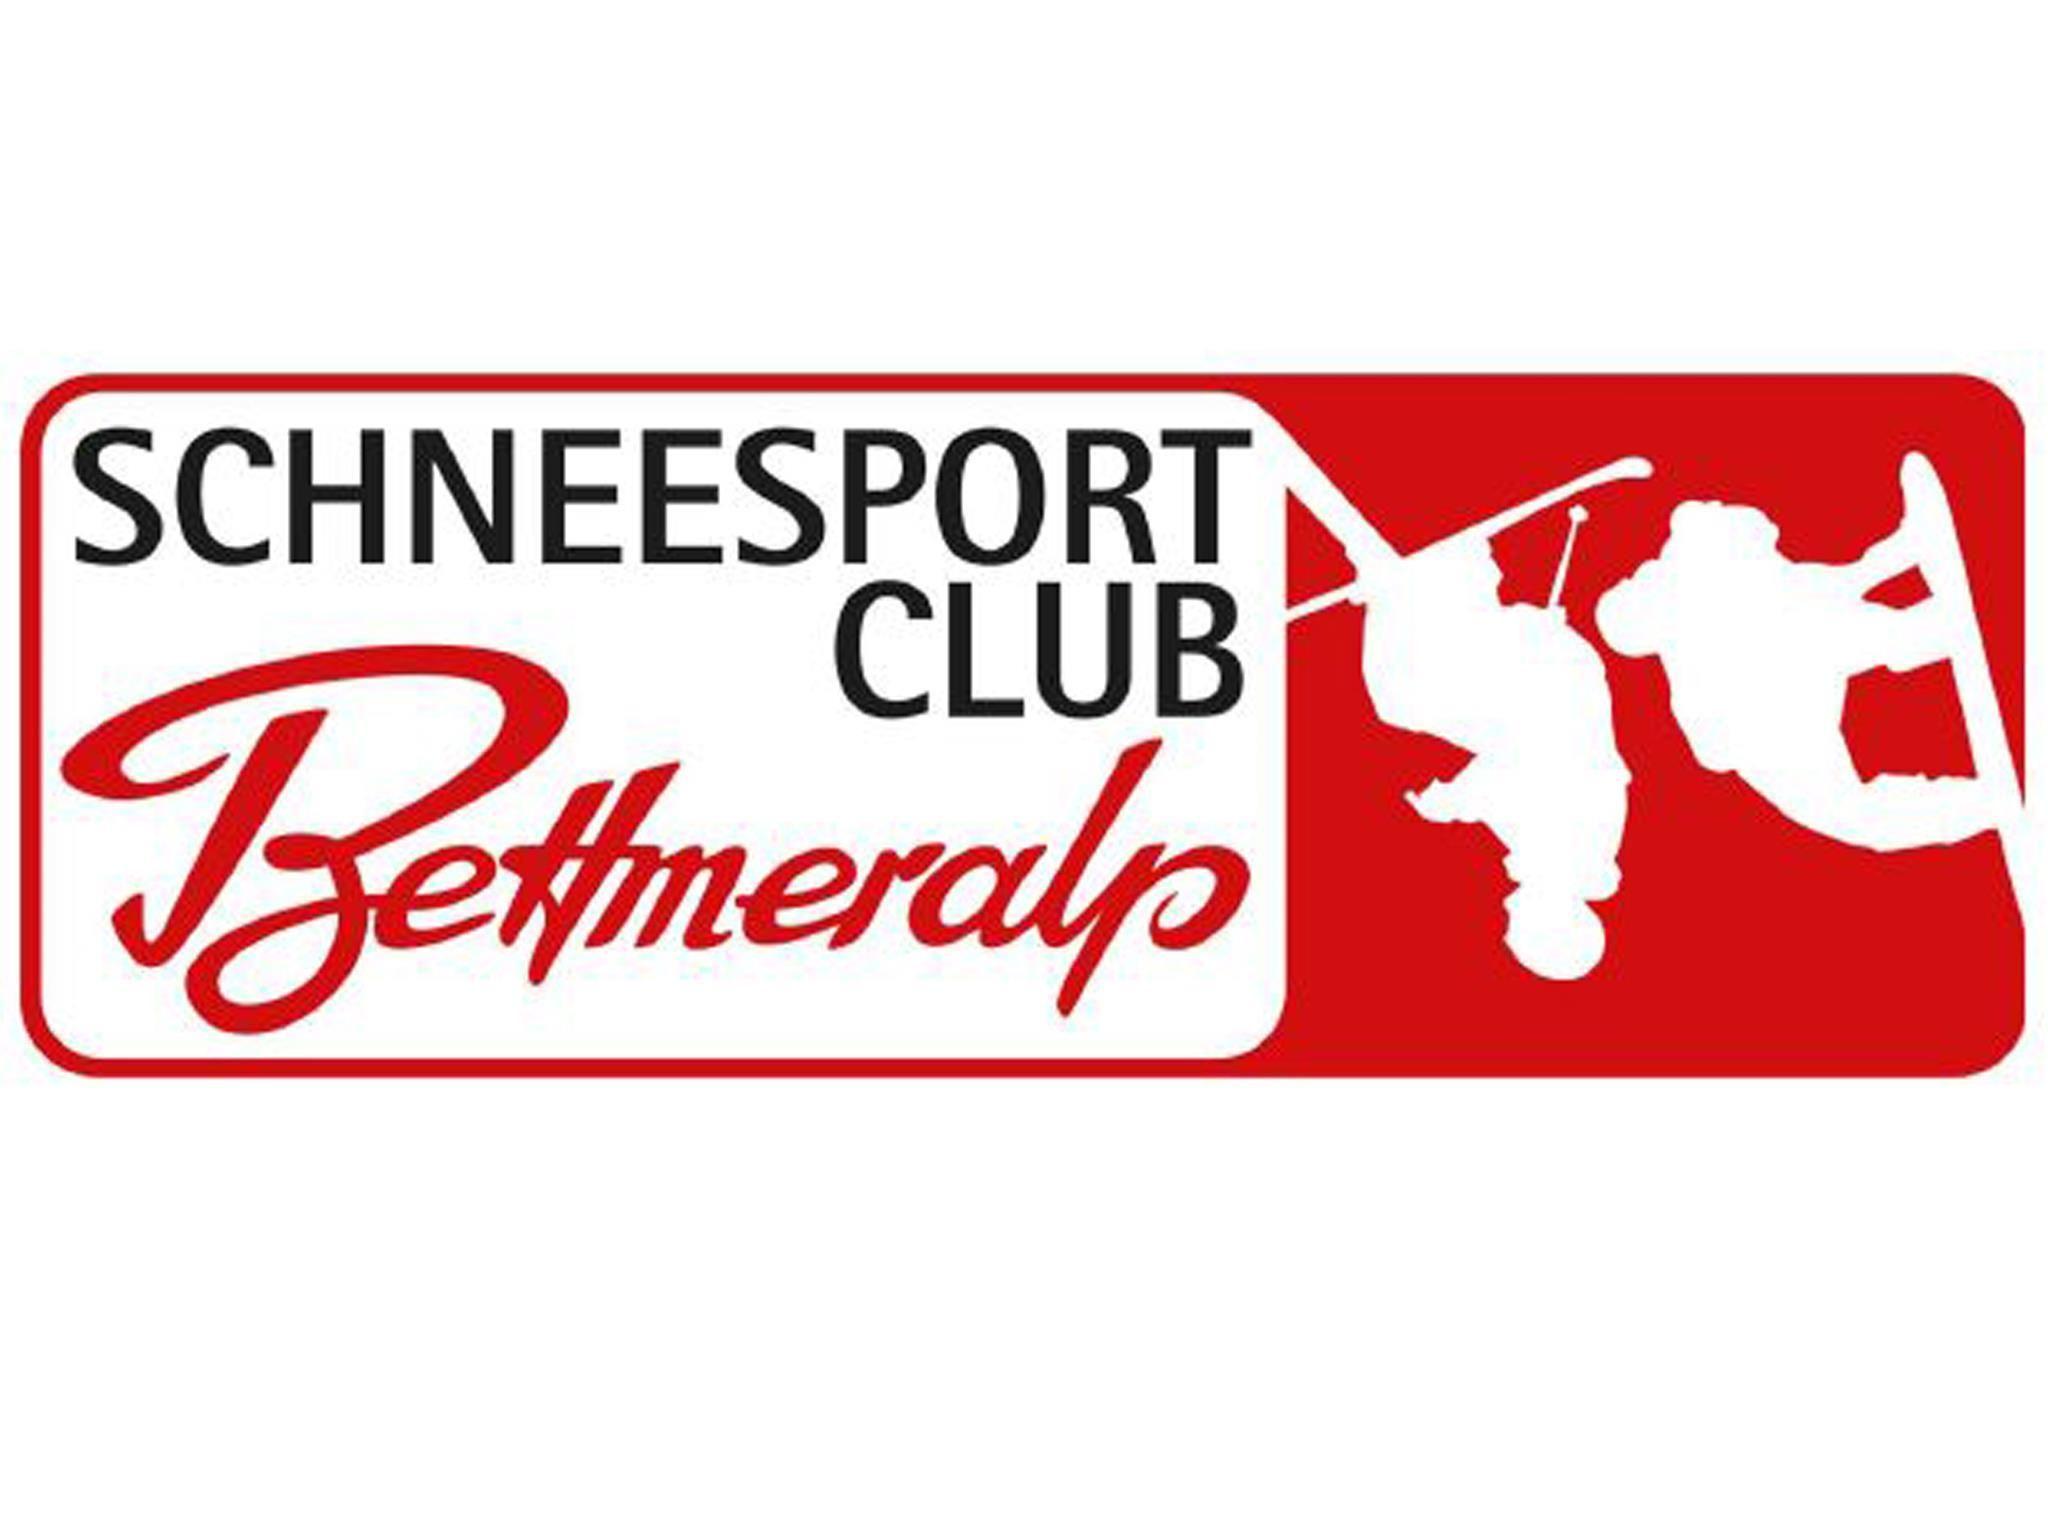 Logo-Schneesportclub-Bettmeralp